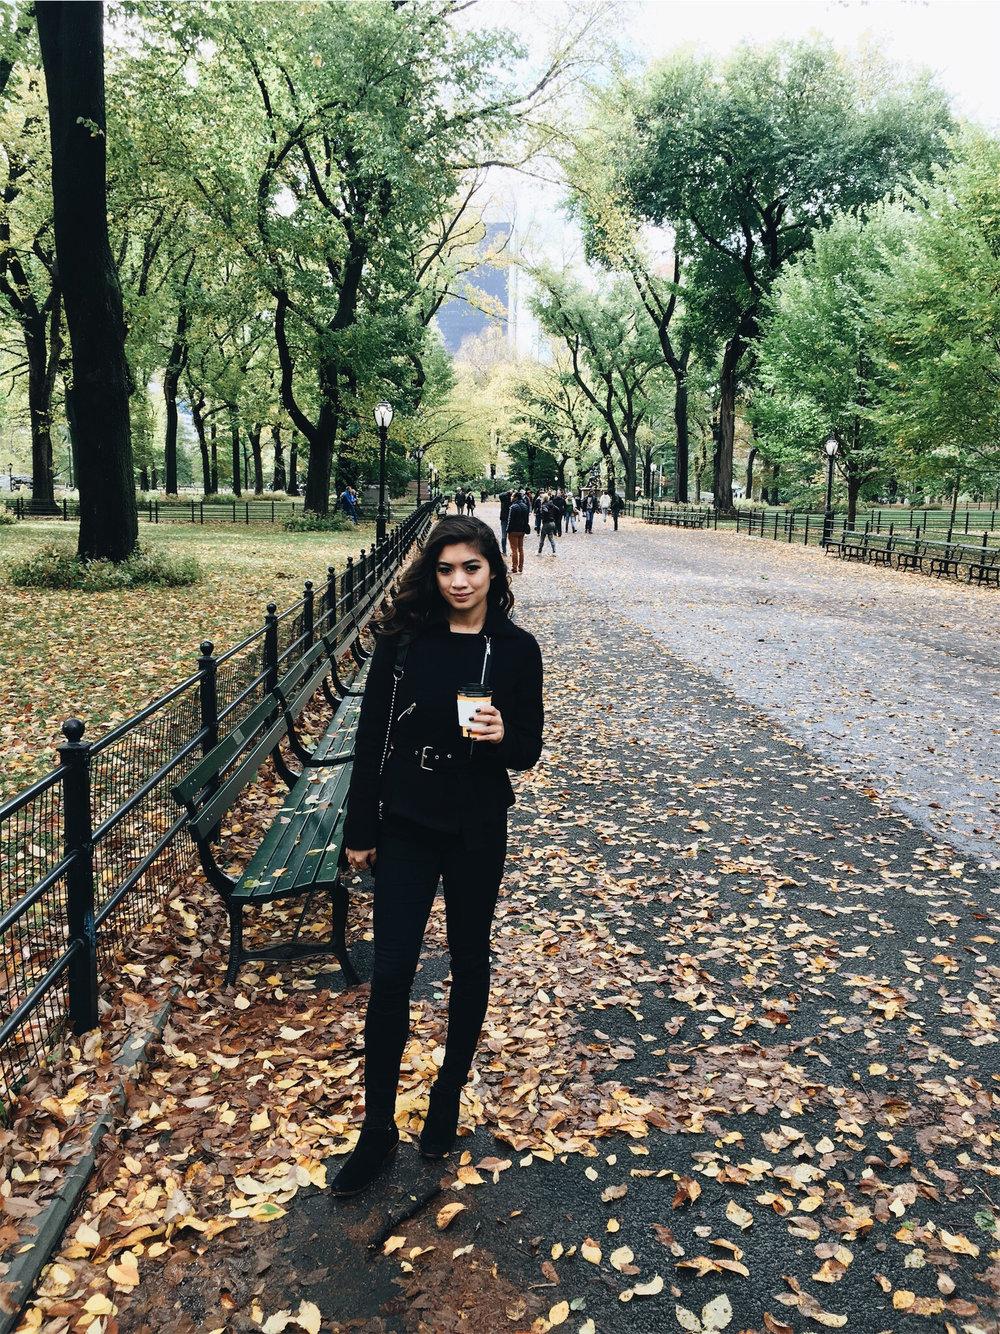 NYC_CENTRAL_PARK.jpg